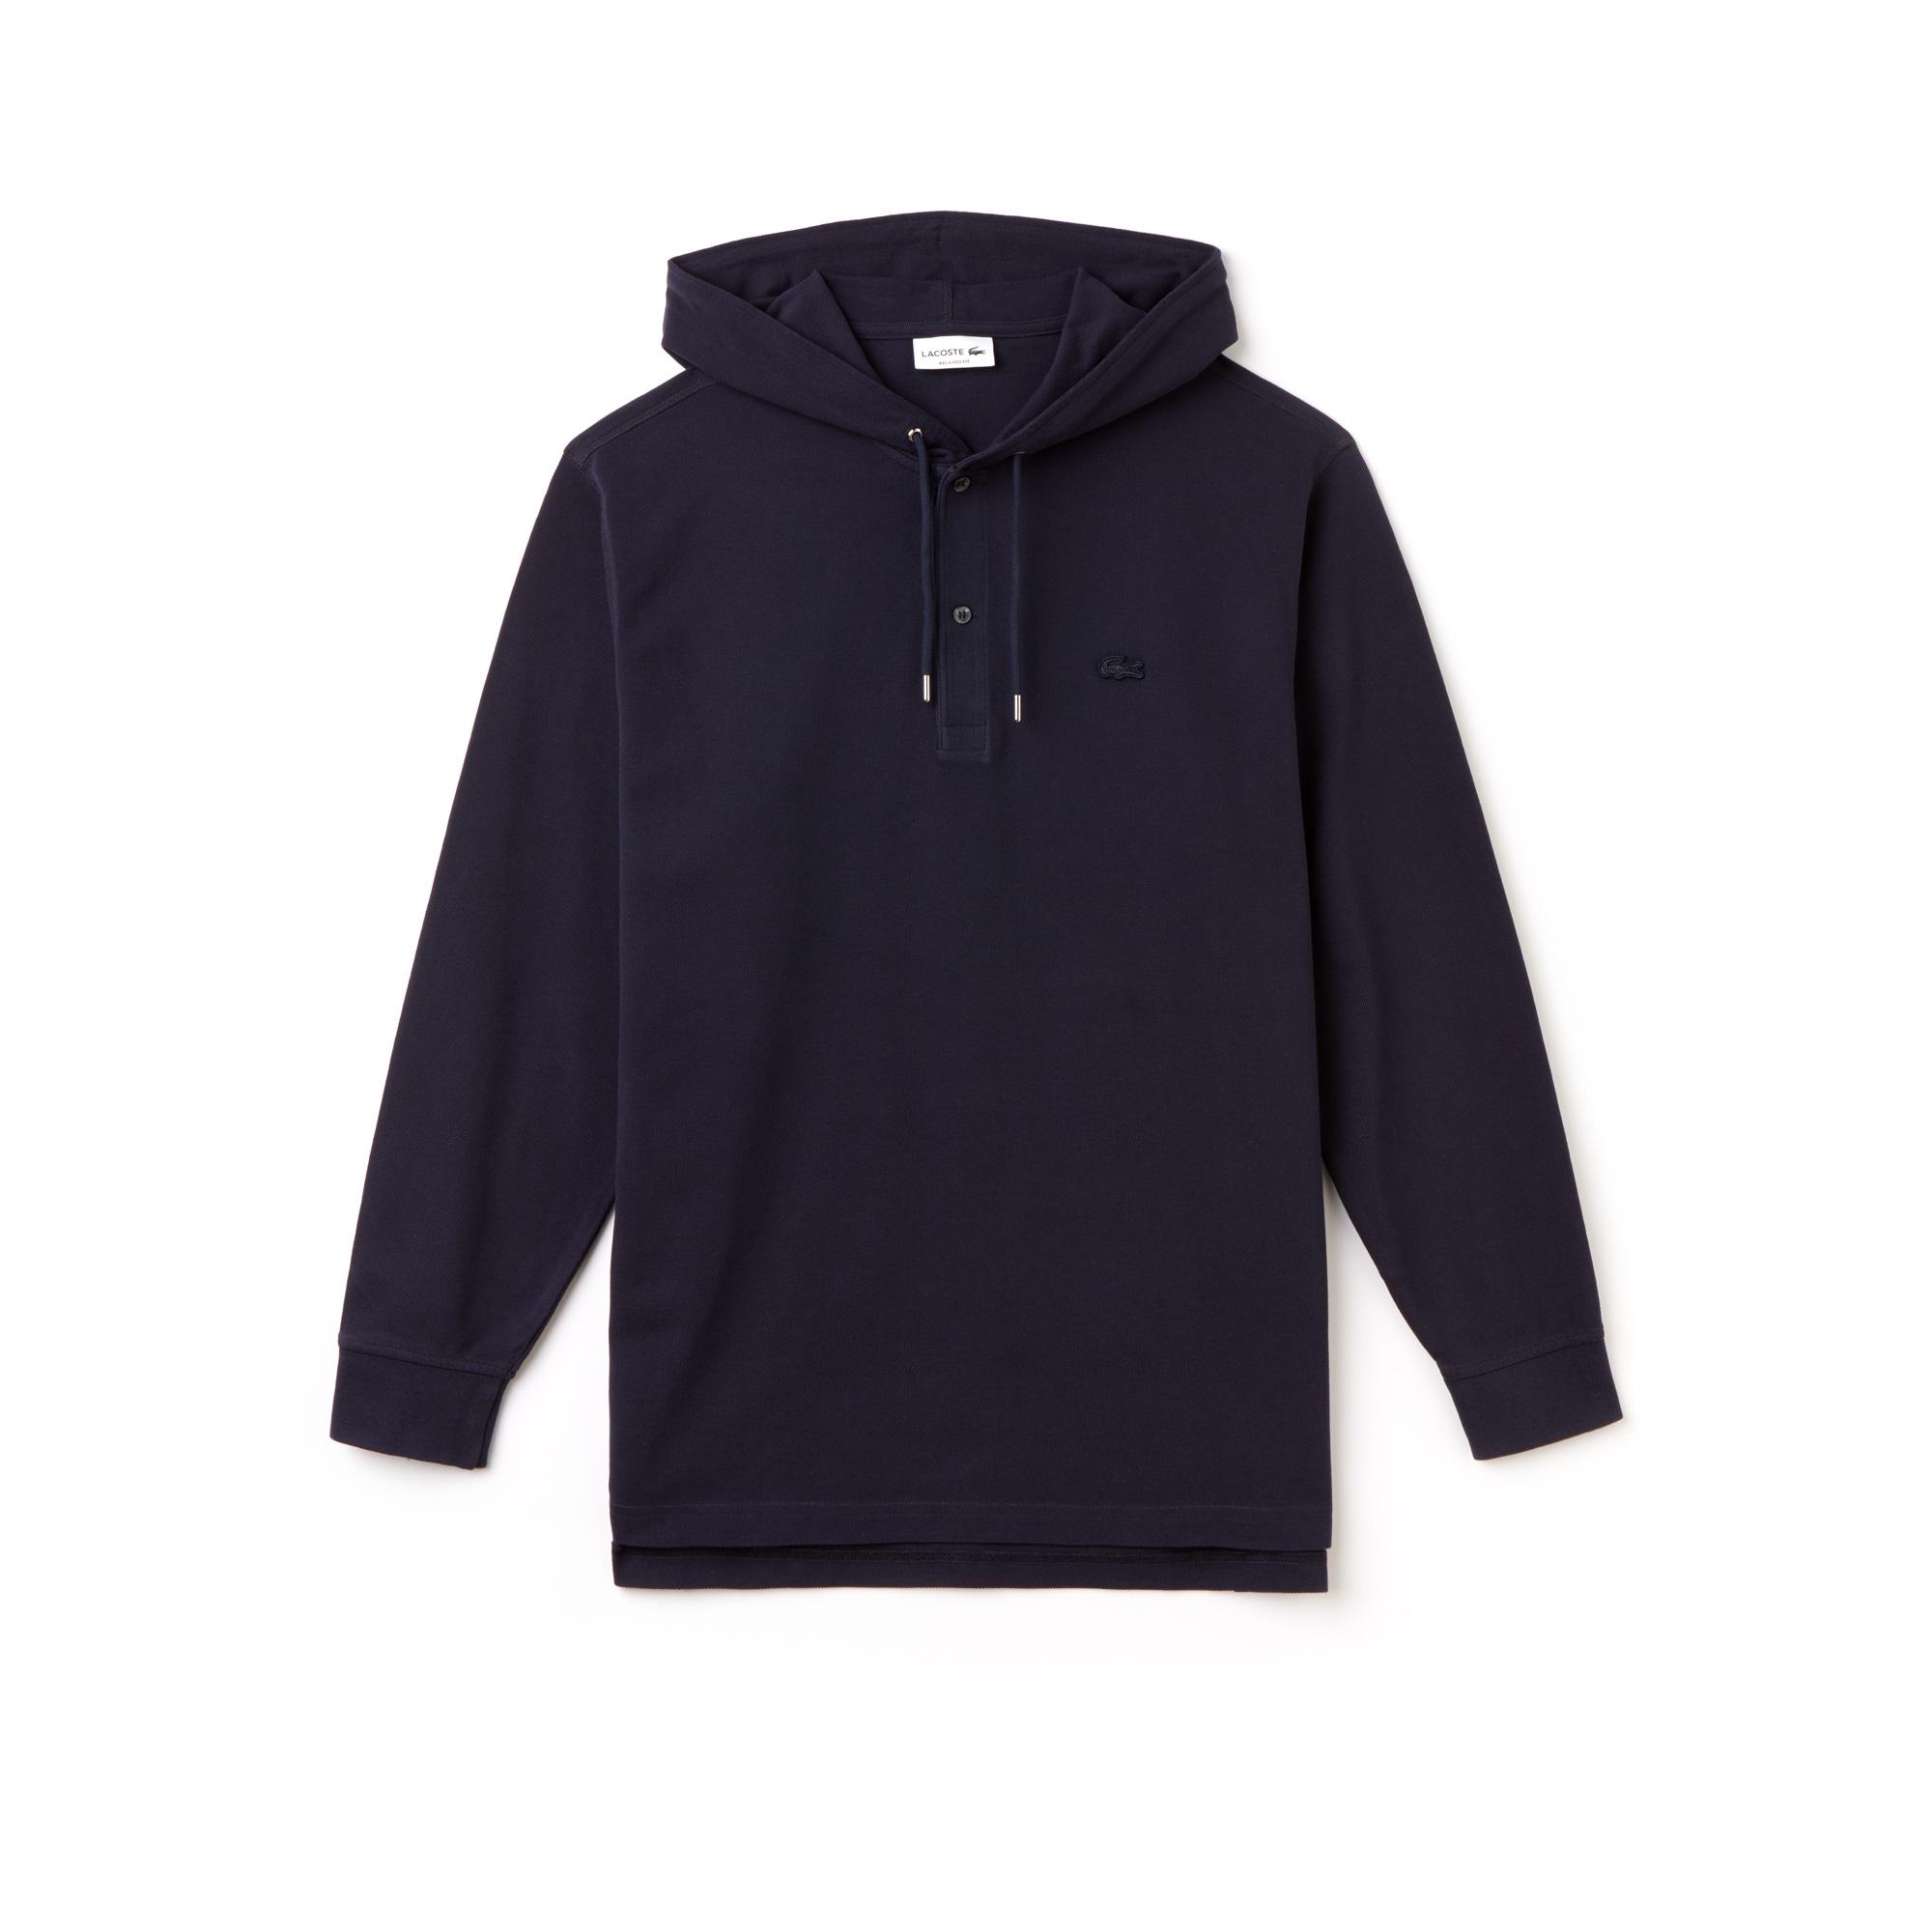 Men's Relaxed Fit Piqué Hooded T-Shirt